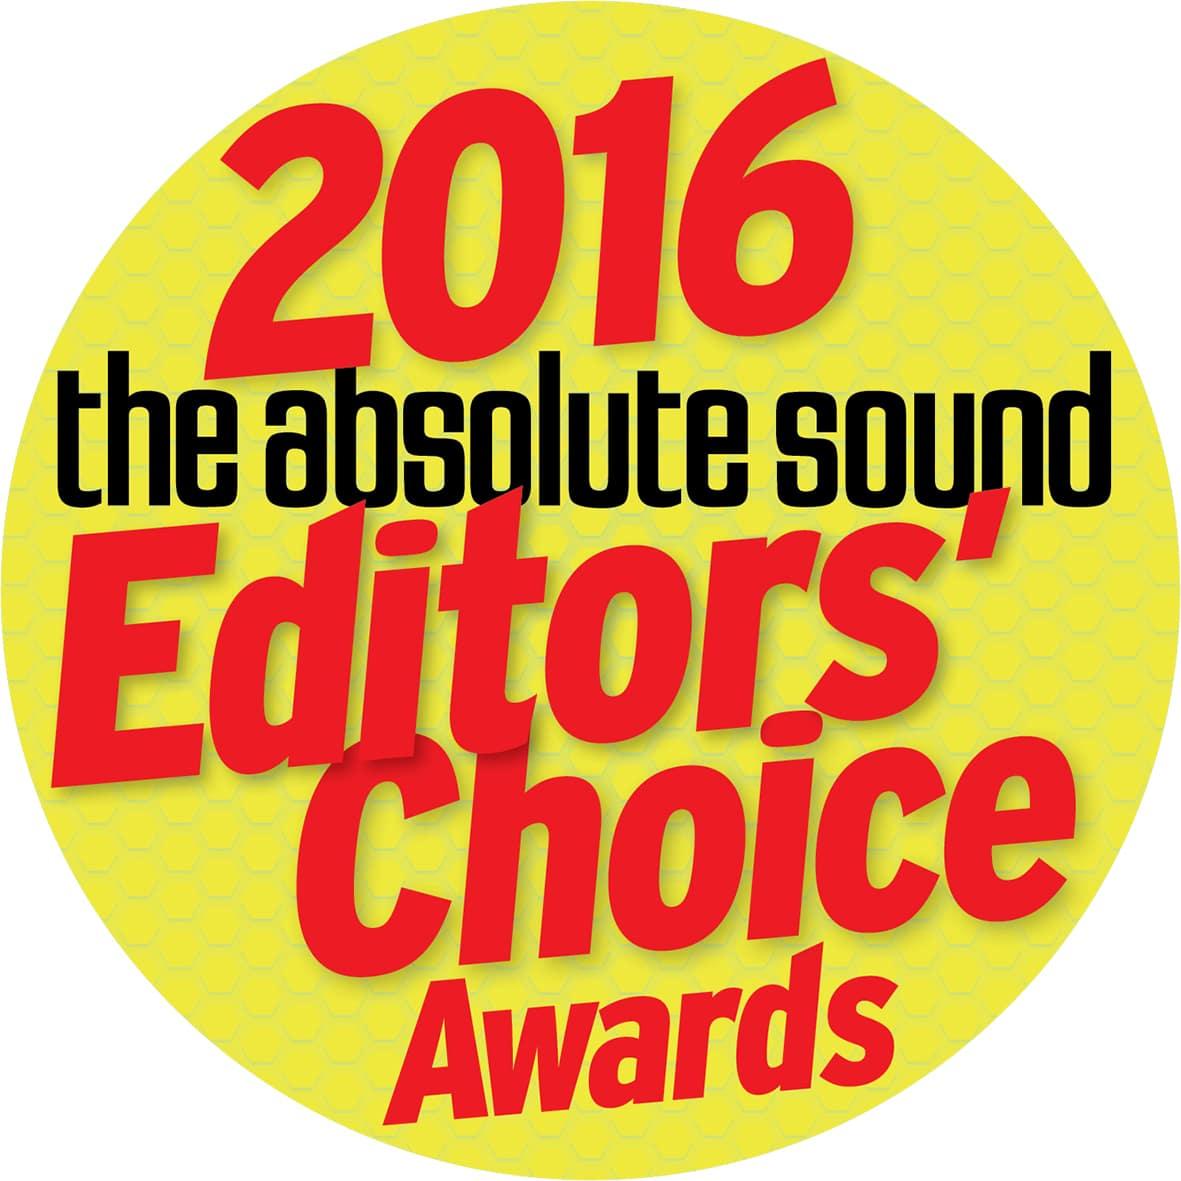 Editors choice award 2016 for S-15